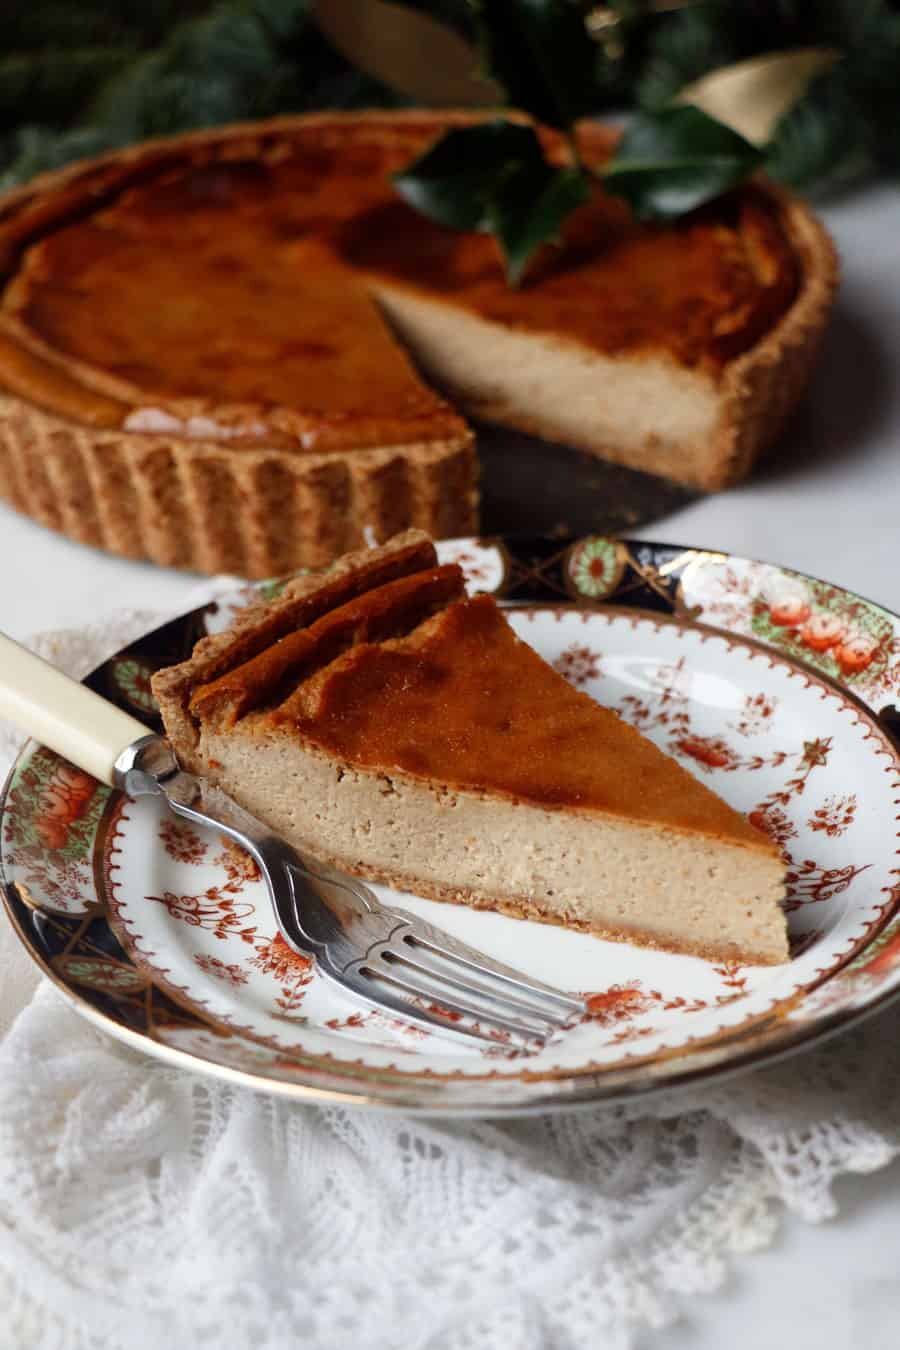 Baked Gingerbread Cheesecake (vegan & gluten-free)